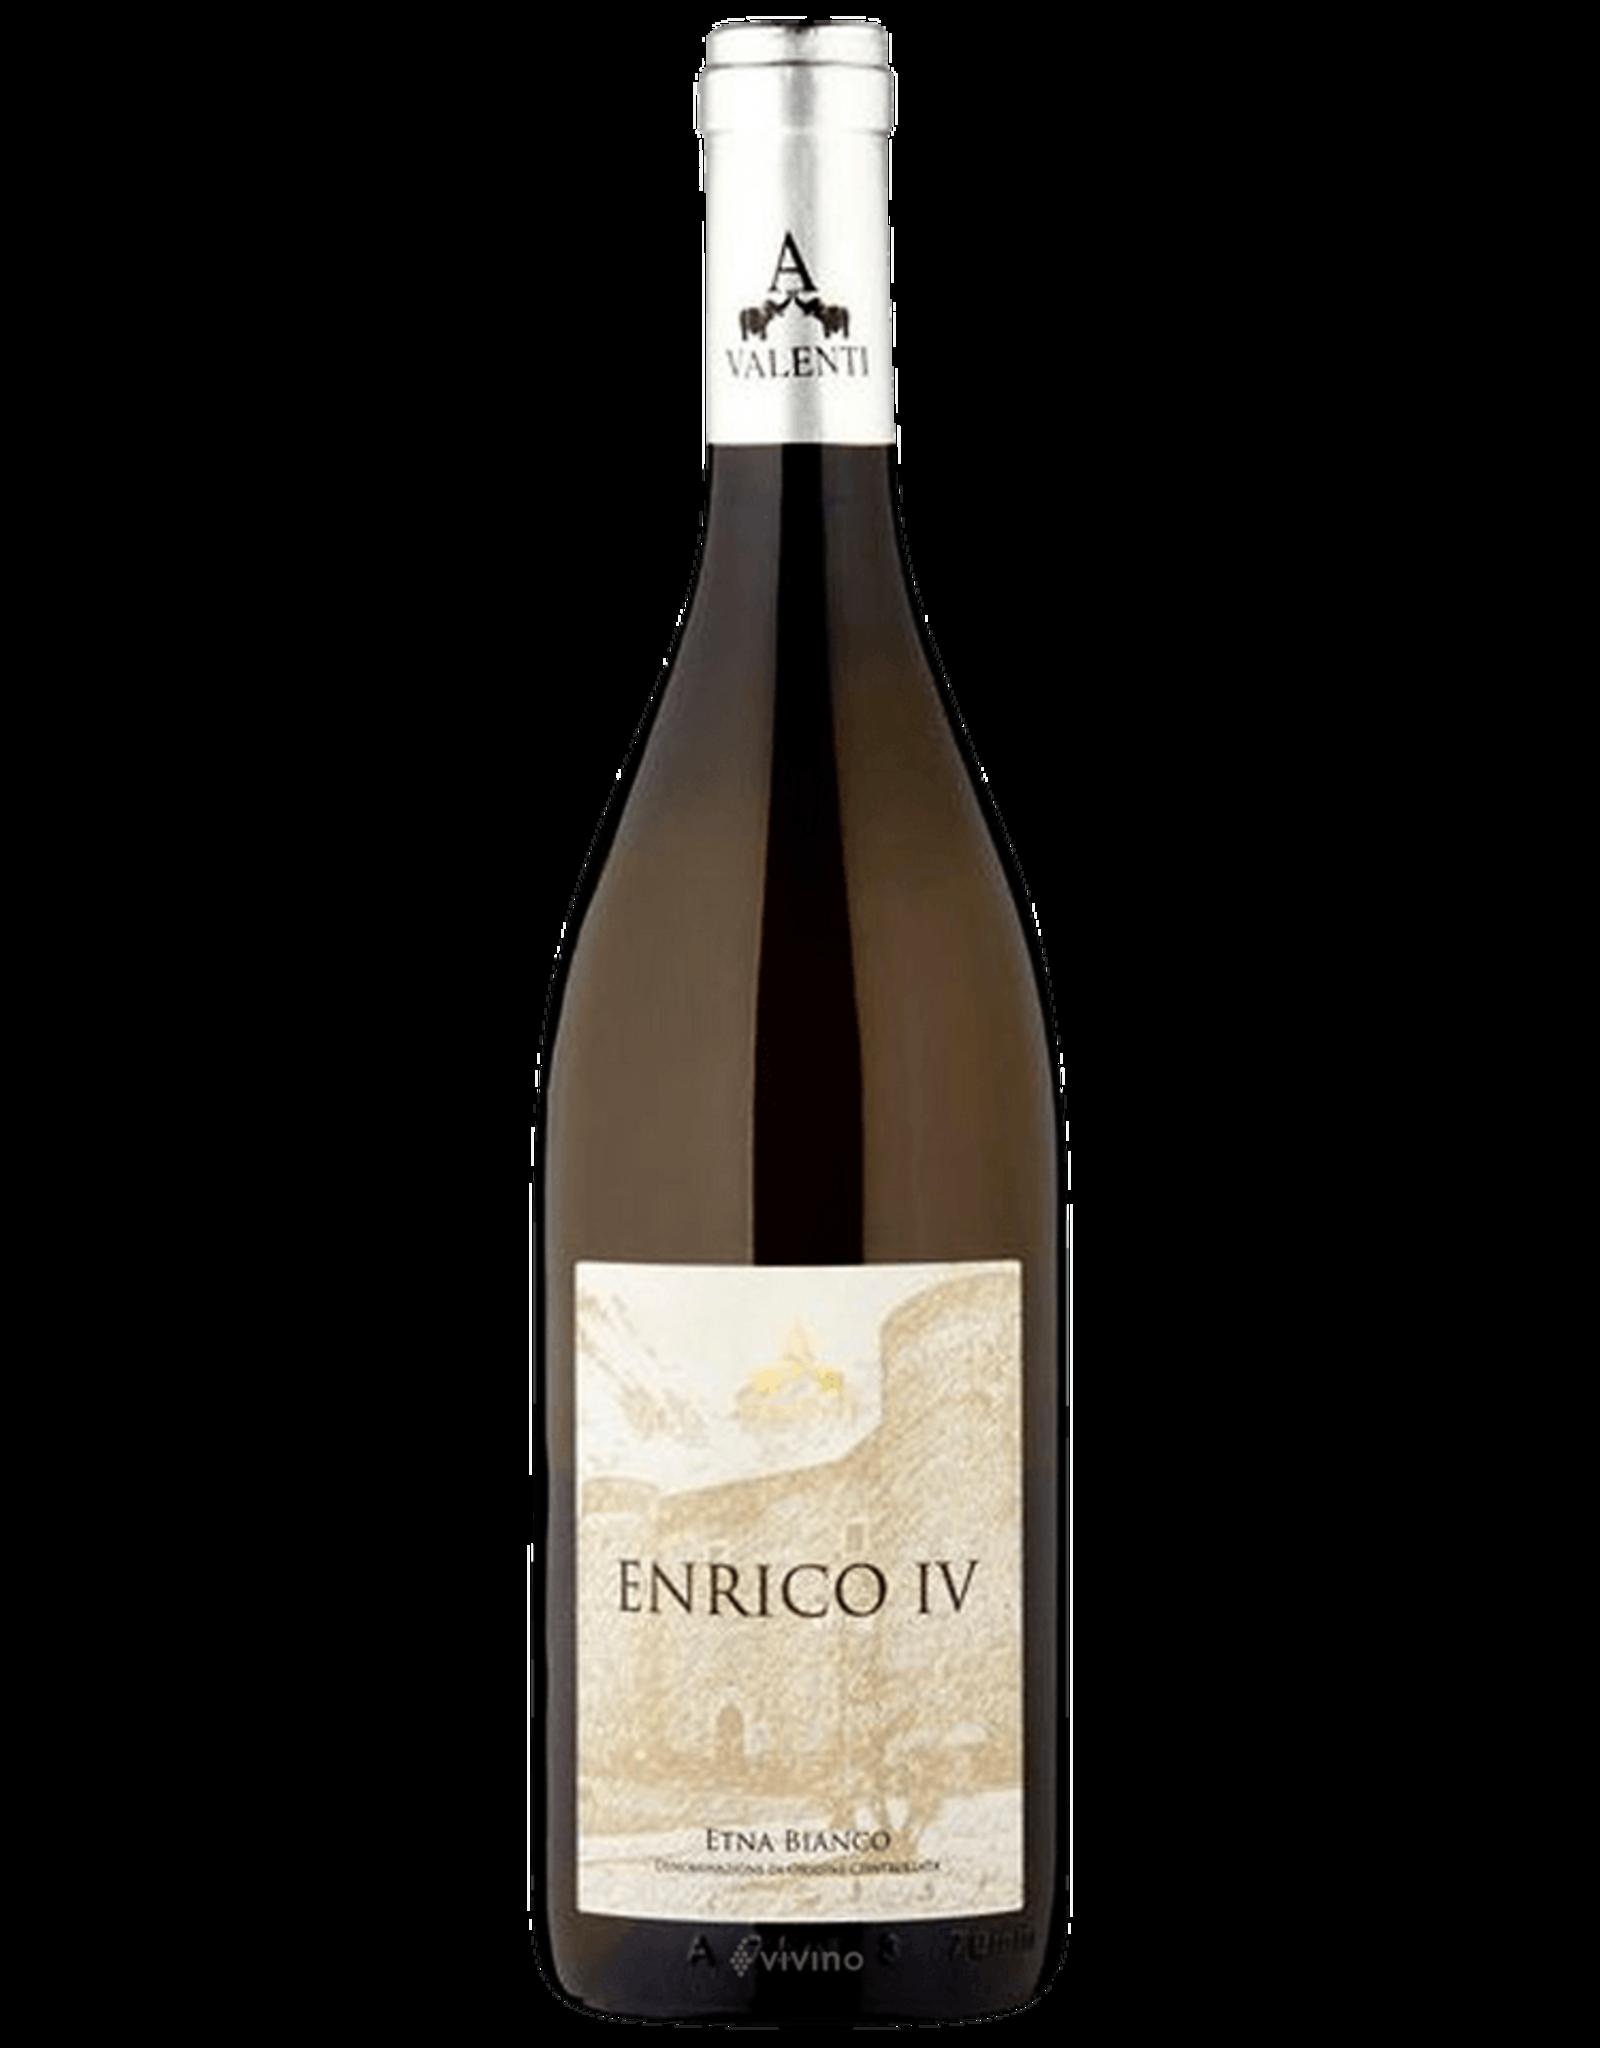 Valenti Enrico IV Etna Bianco 2018